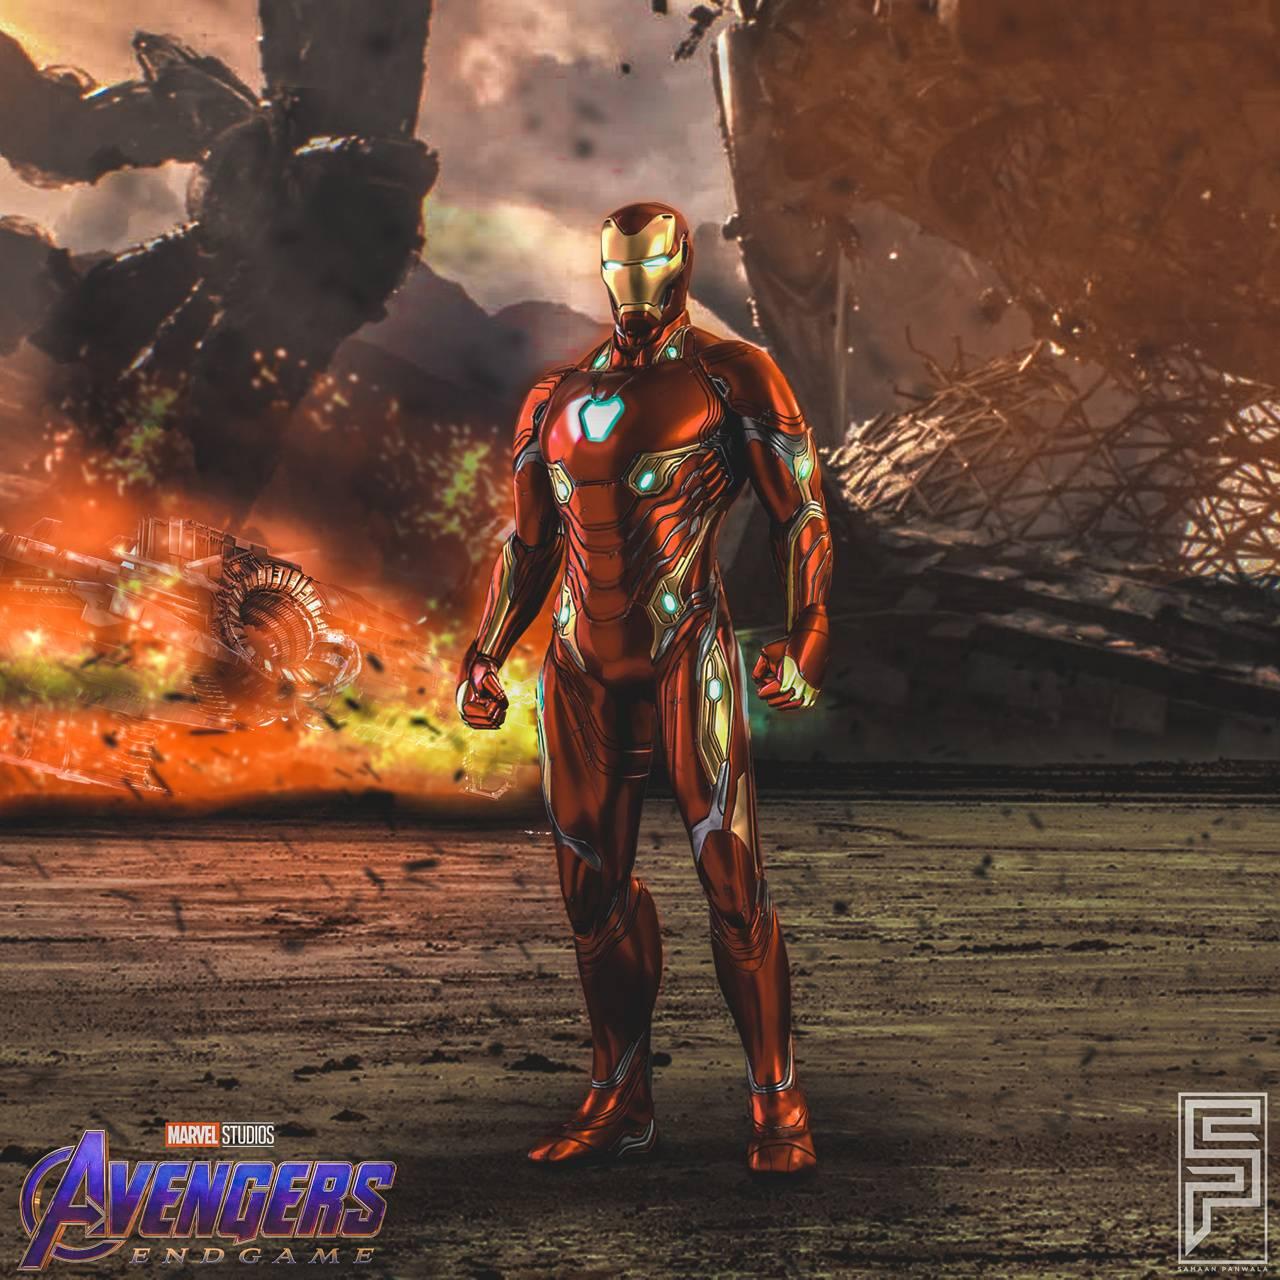 Iron Man Mark 50 Wallpaper By Samaanpanwala 99 Free On Zedge